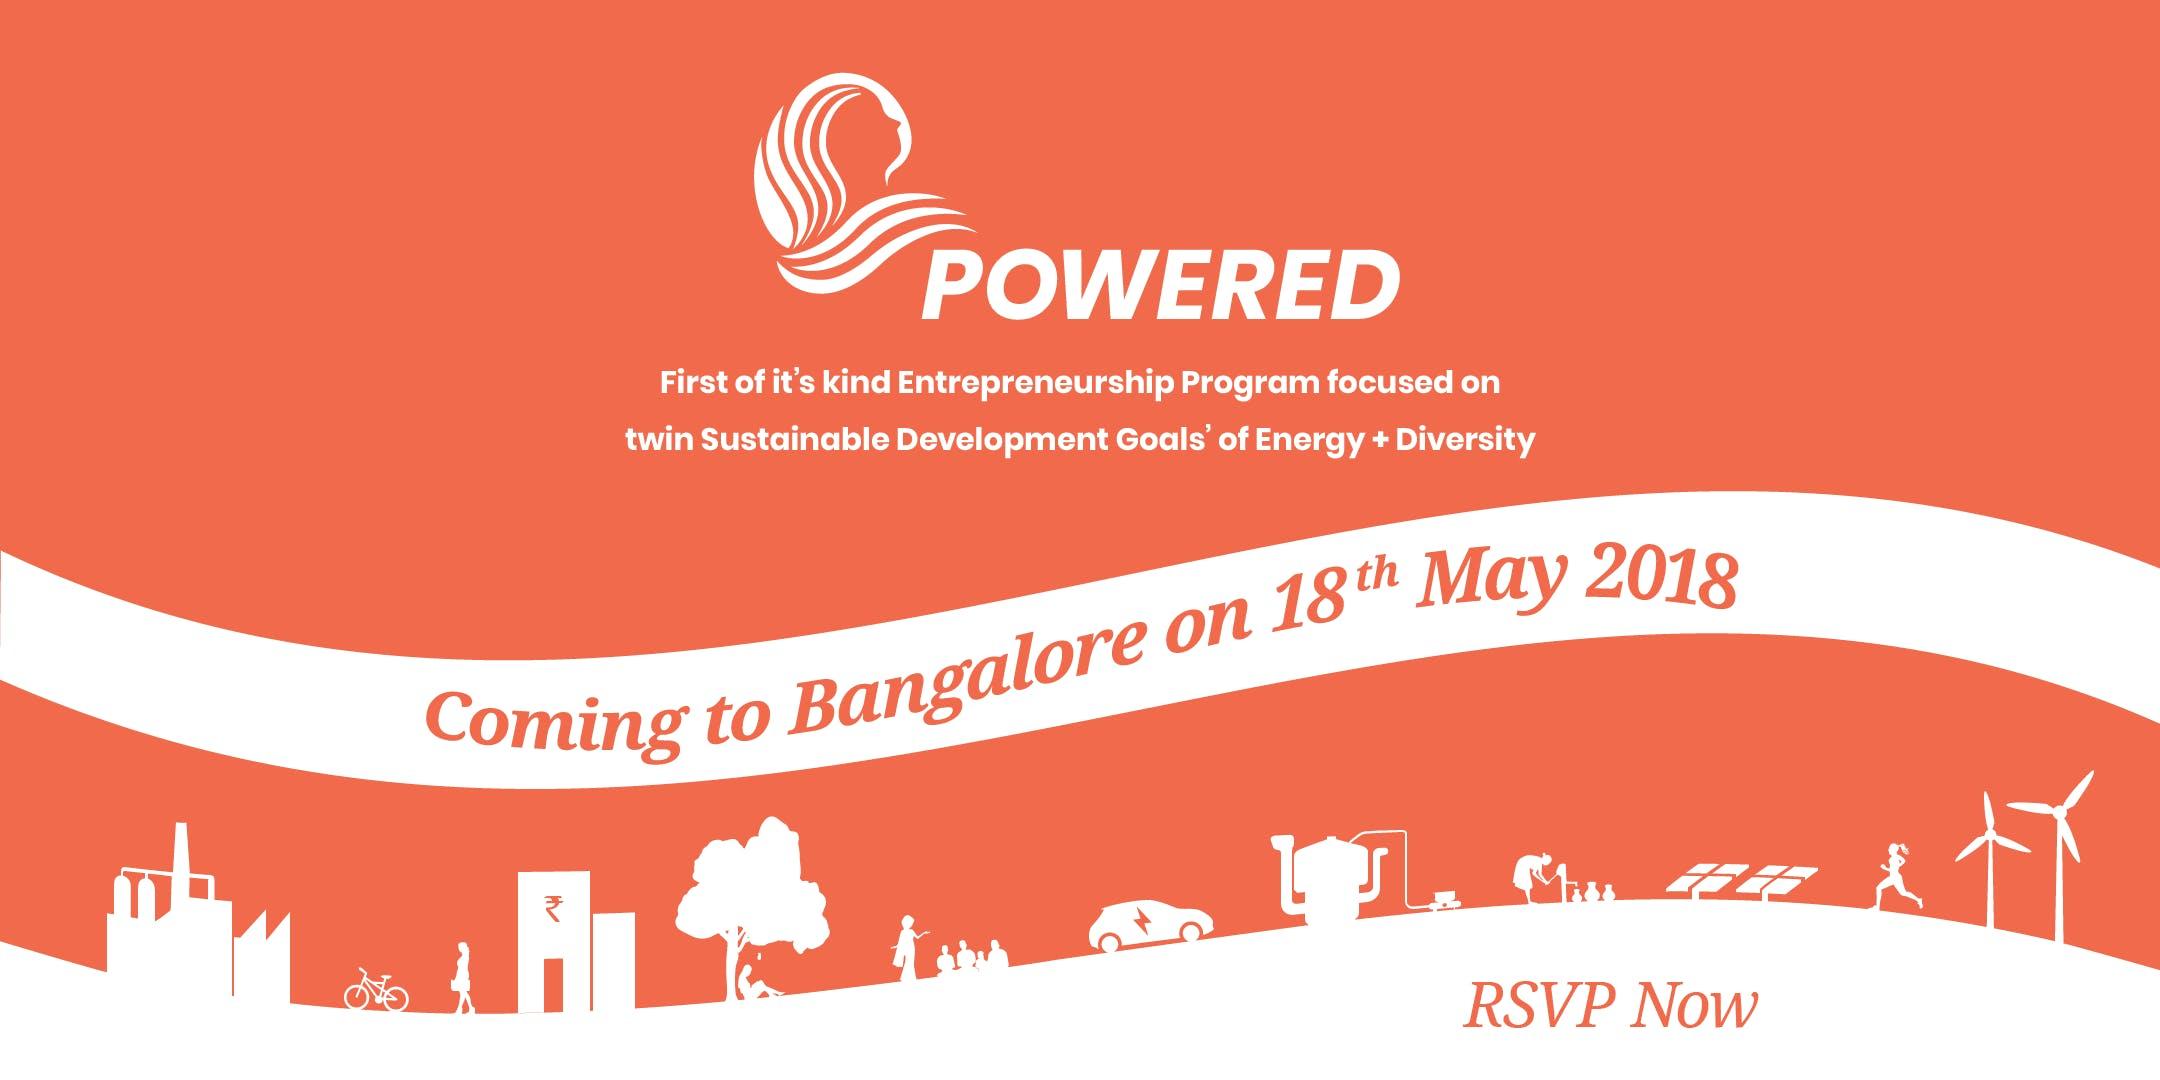 Bangalore Launch POWERED - Energy Access and Gender Diversity Entrepreneurship Program